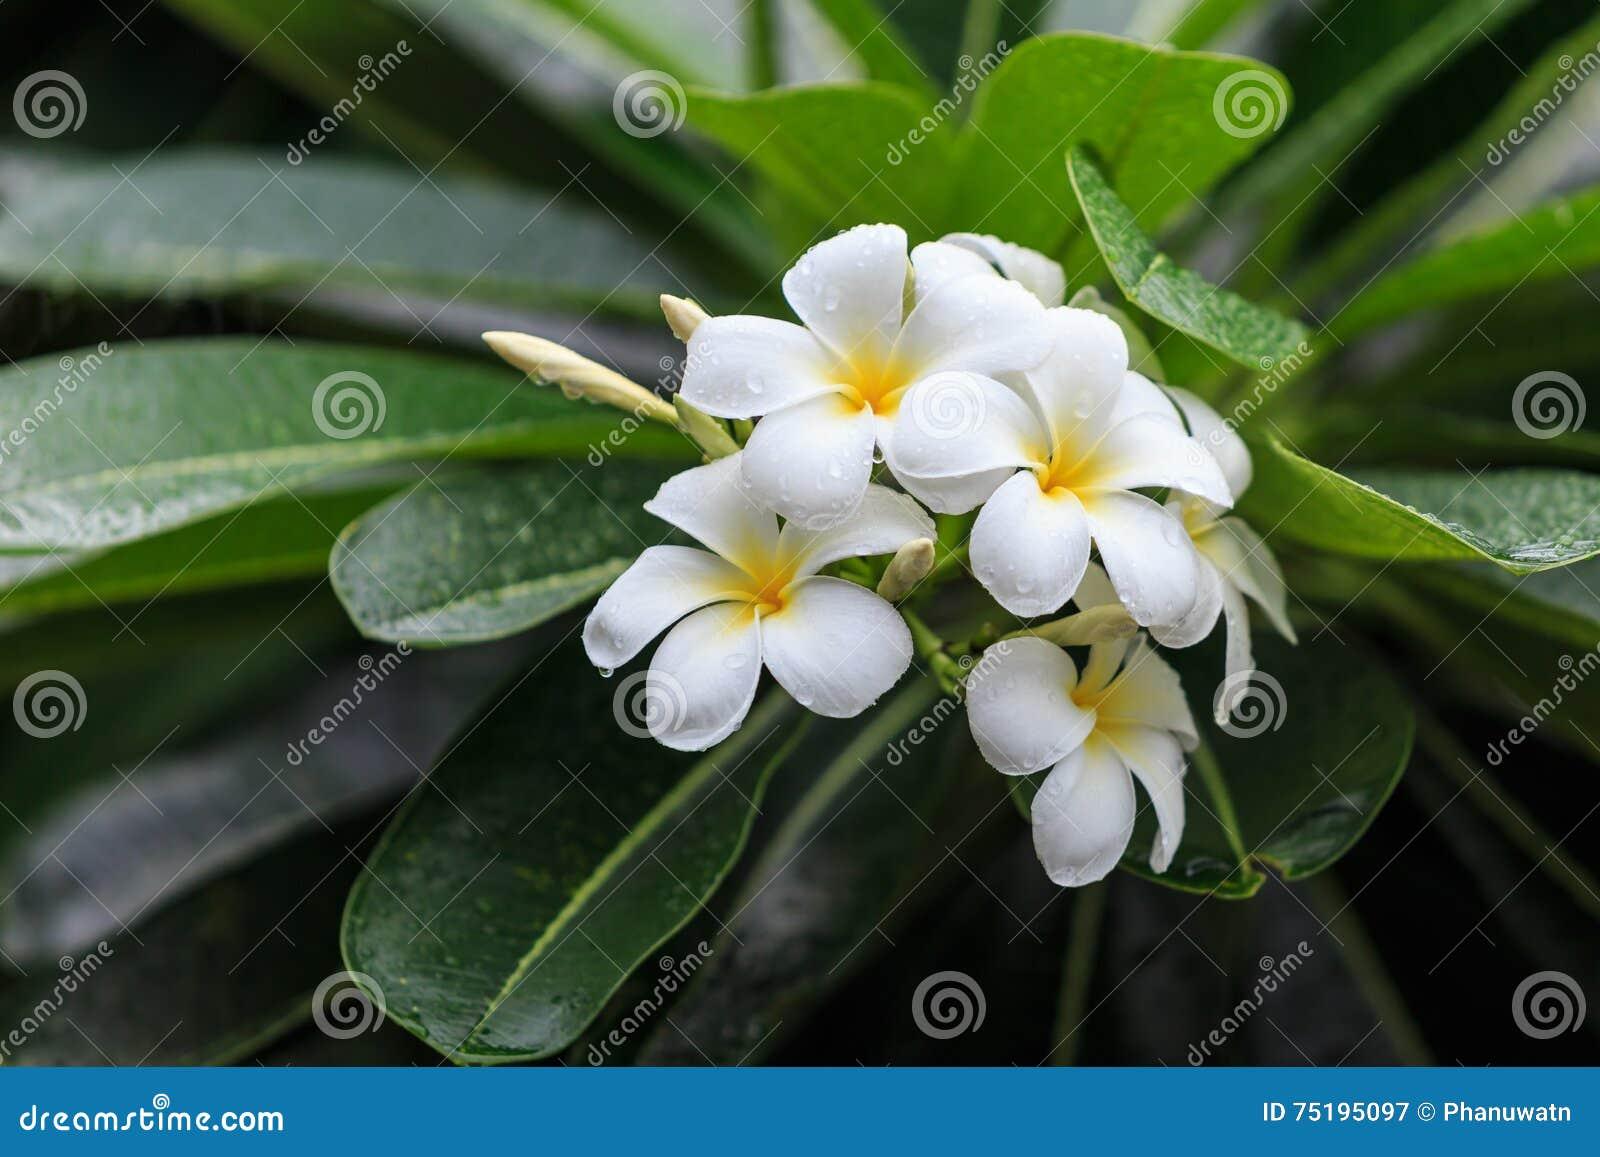 White And Yellow Tropical Flowers Frangipani Plumeria On Tree